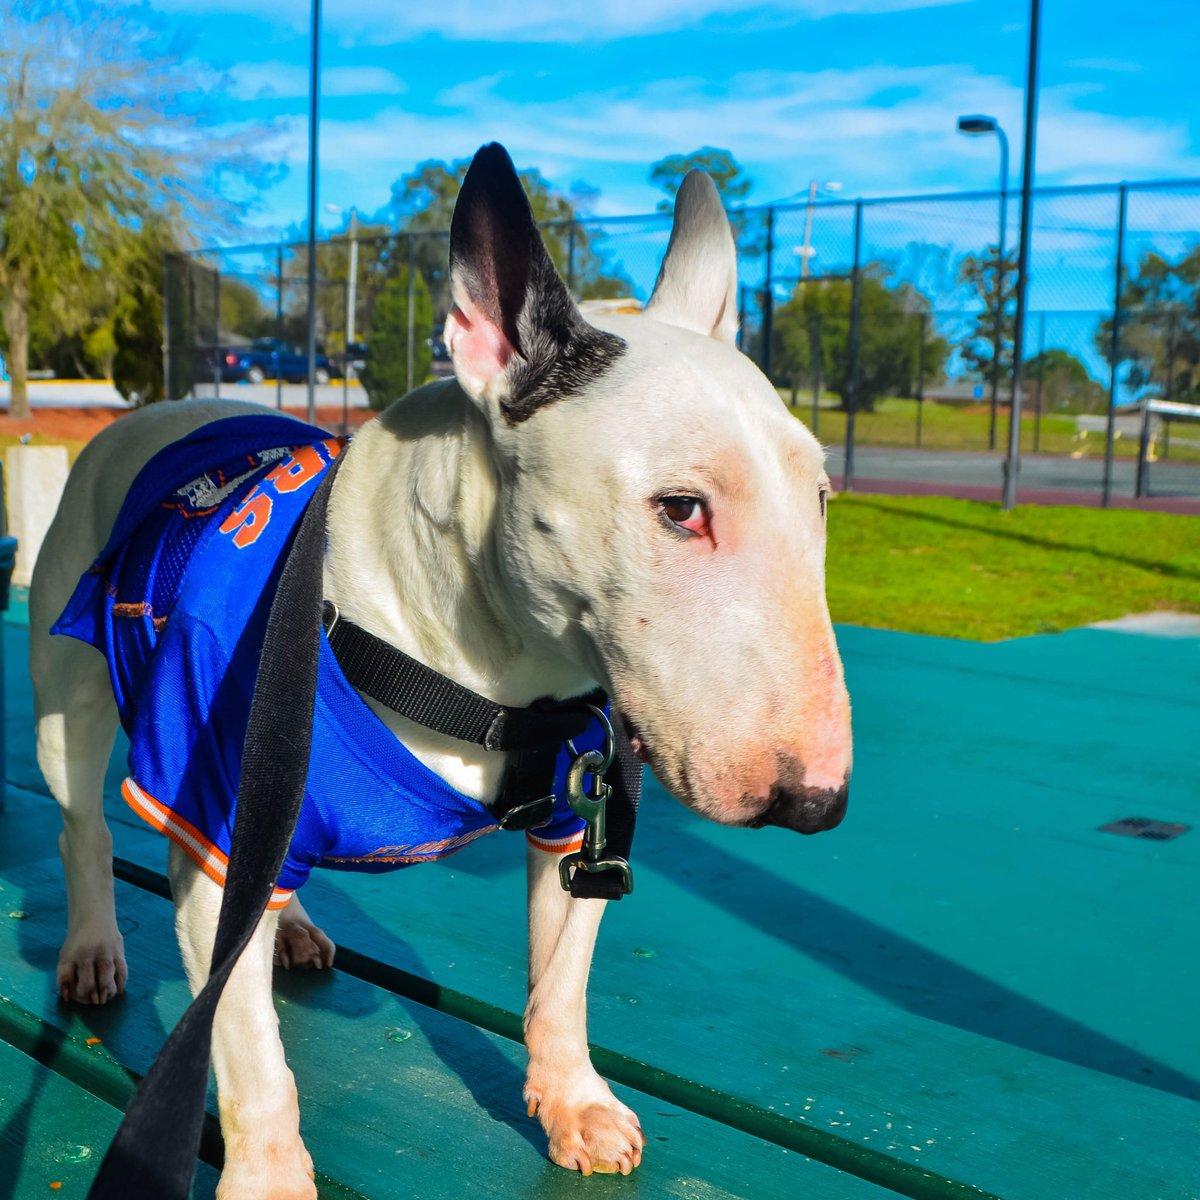 That's some serious side eye mate! . . . #bullterrier #bullterrierlove #dogsoftwitter  #ebt #bullies #doglover #dogoftheday #dogmodel #doglife #mansbestfriend #ilovemydog #ブルテリア#traveldog #dogtravel #bullterrierlovers #bullterriertravels #dogsoflondon<br>http://pic.twitter.com/hE9UluasCs